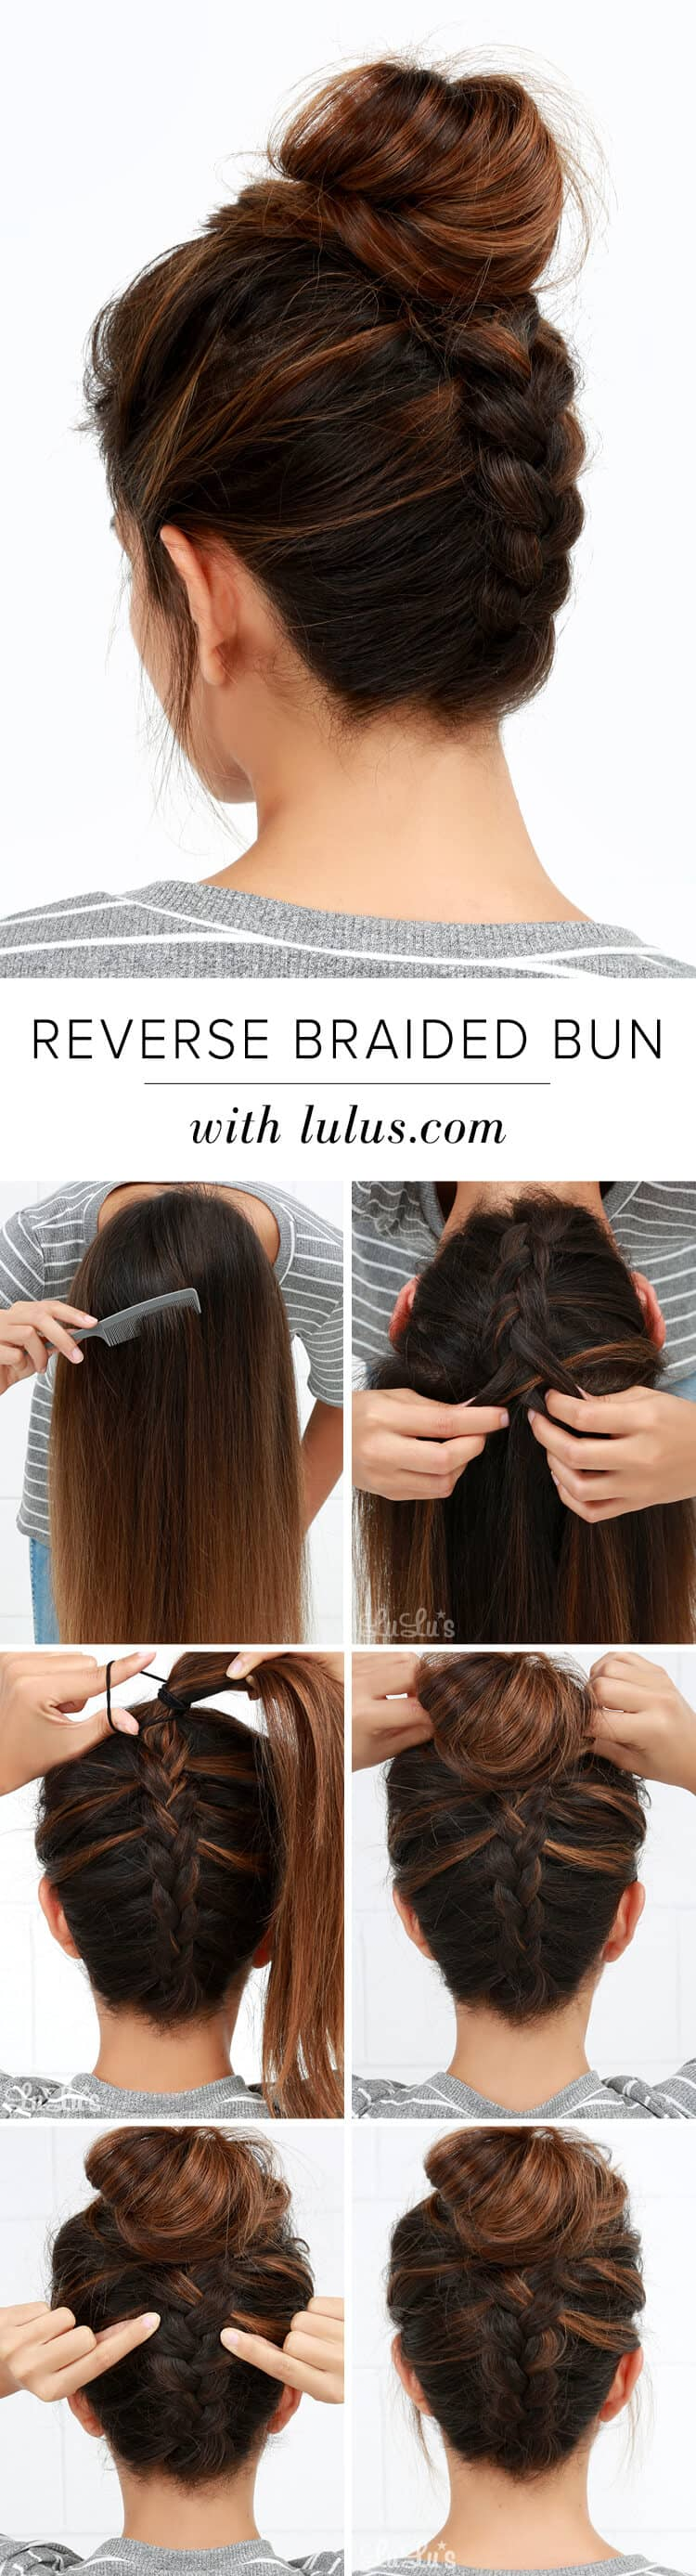 Reverse Normal Braided Bun Updo